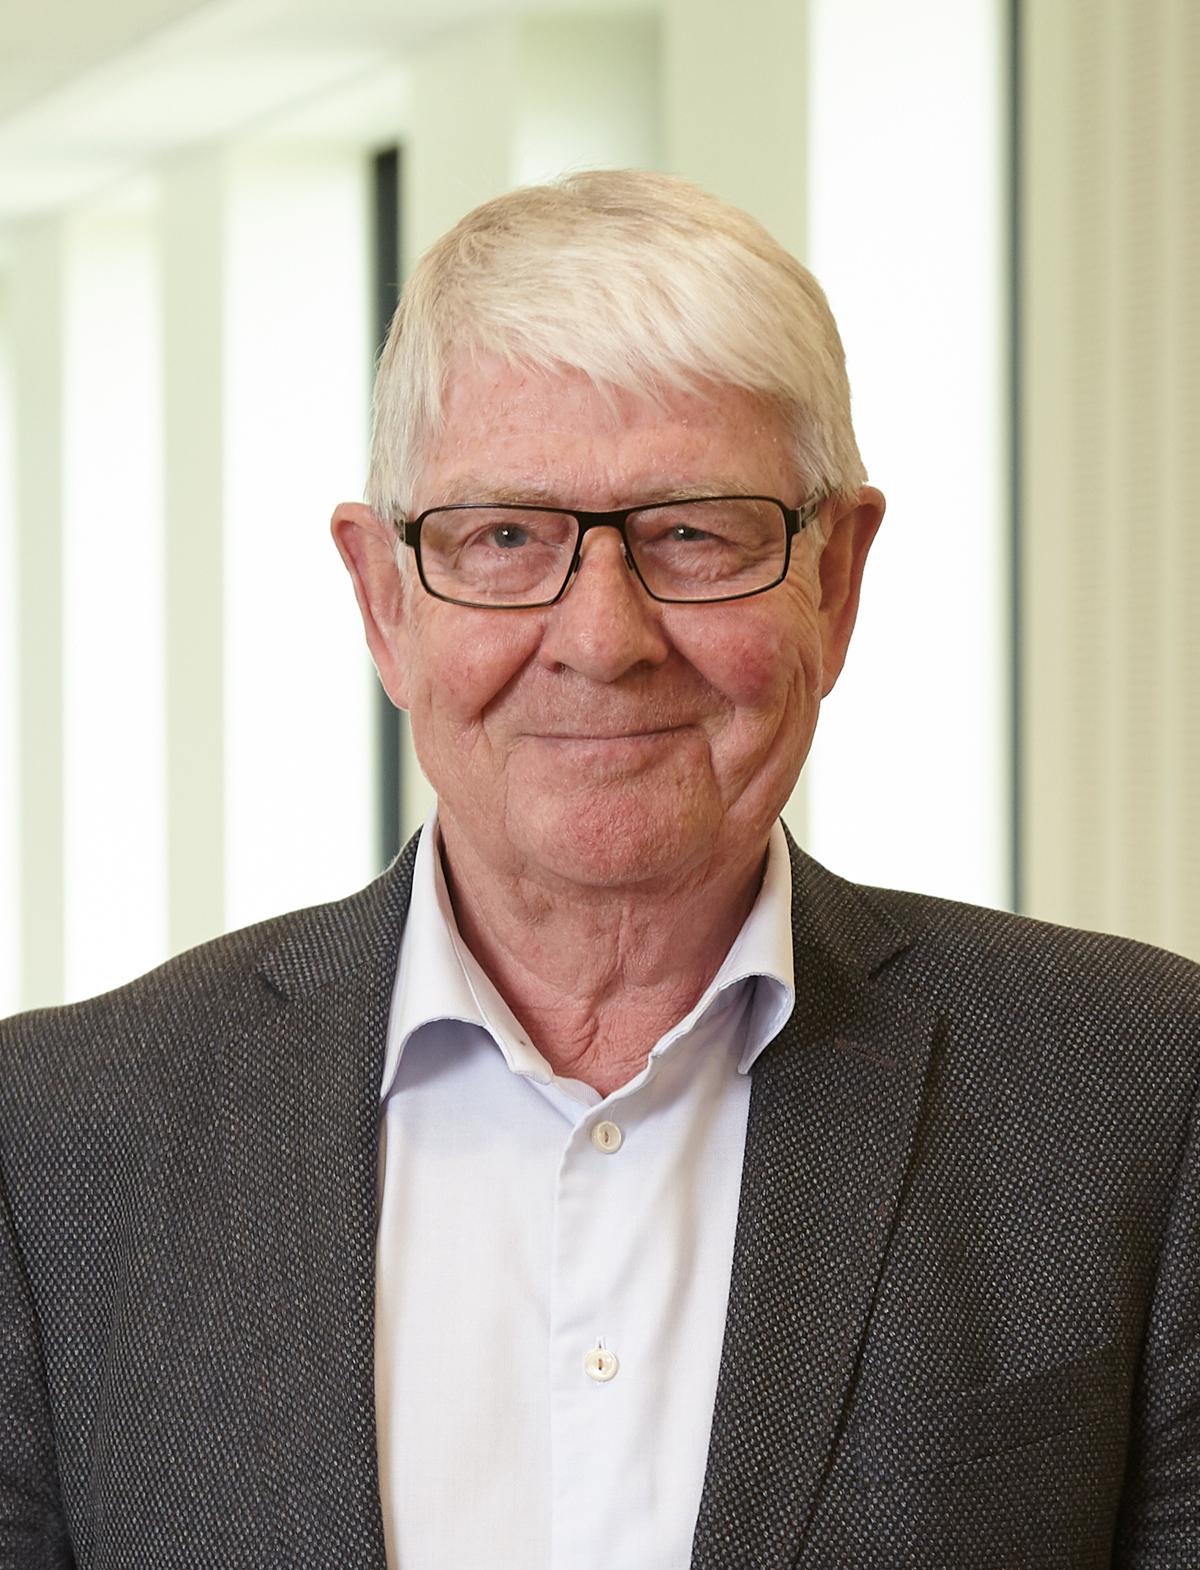 Dansk ældreråd Mogens Rasmussen